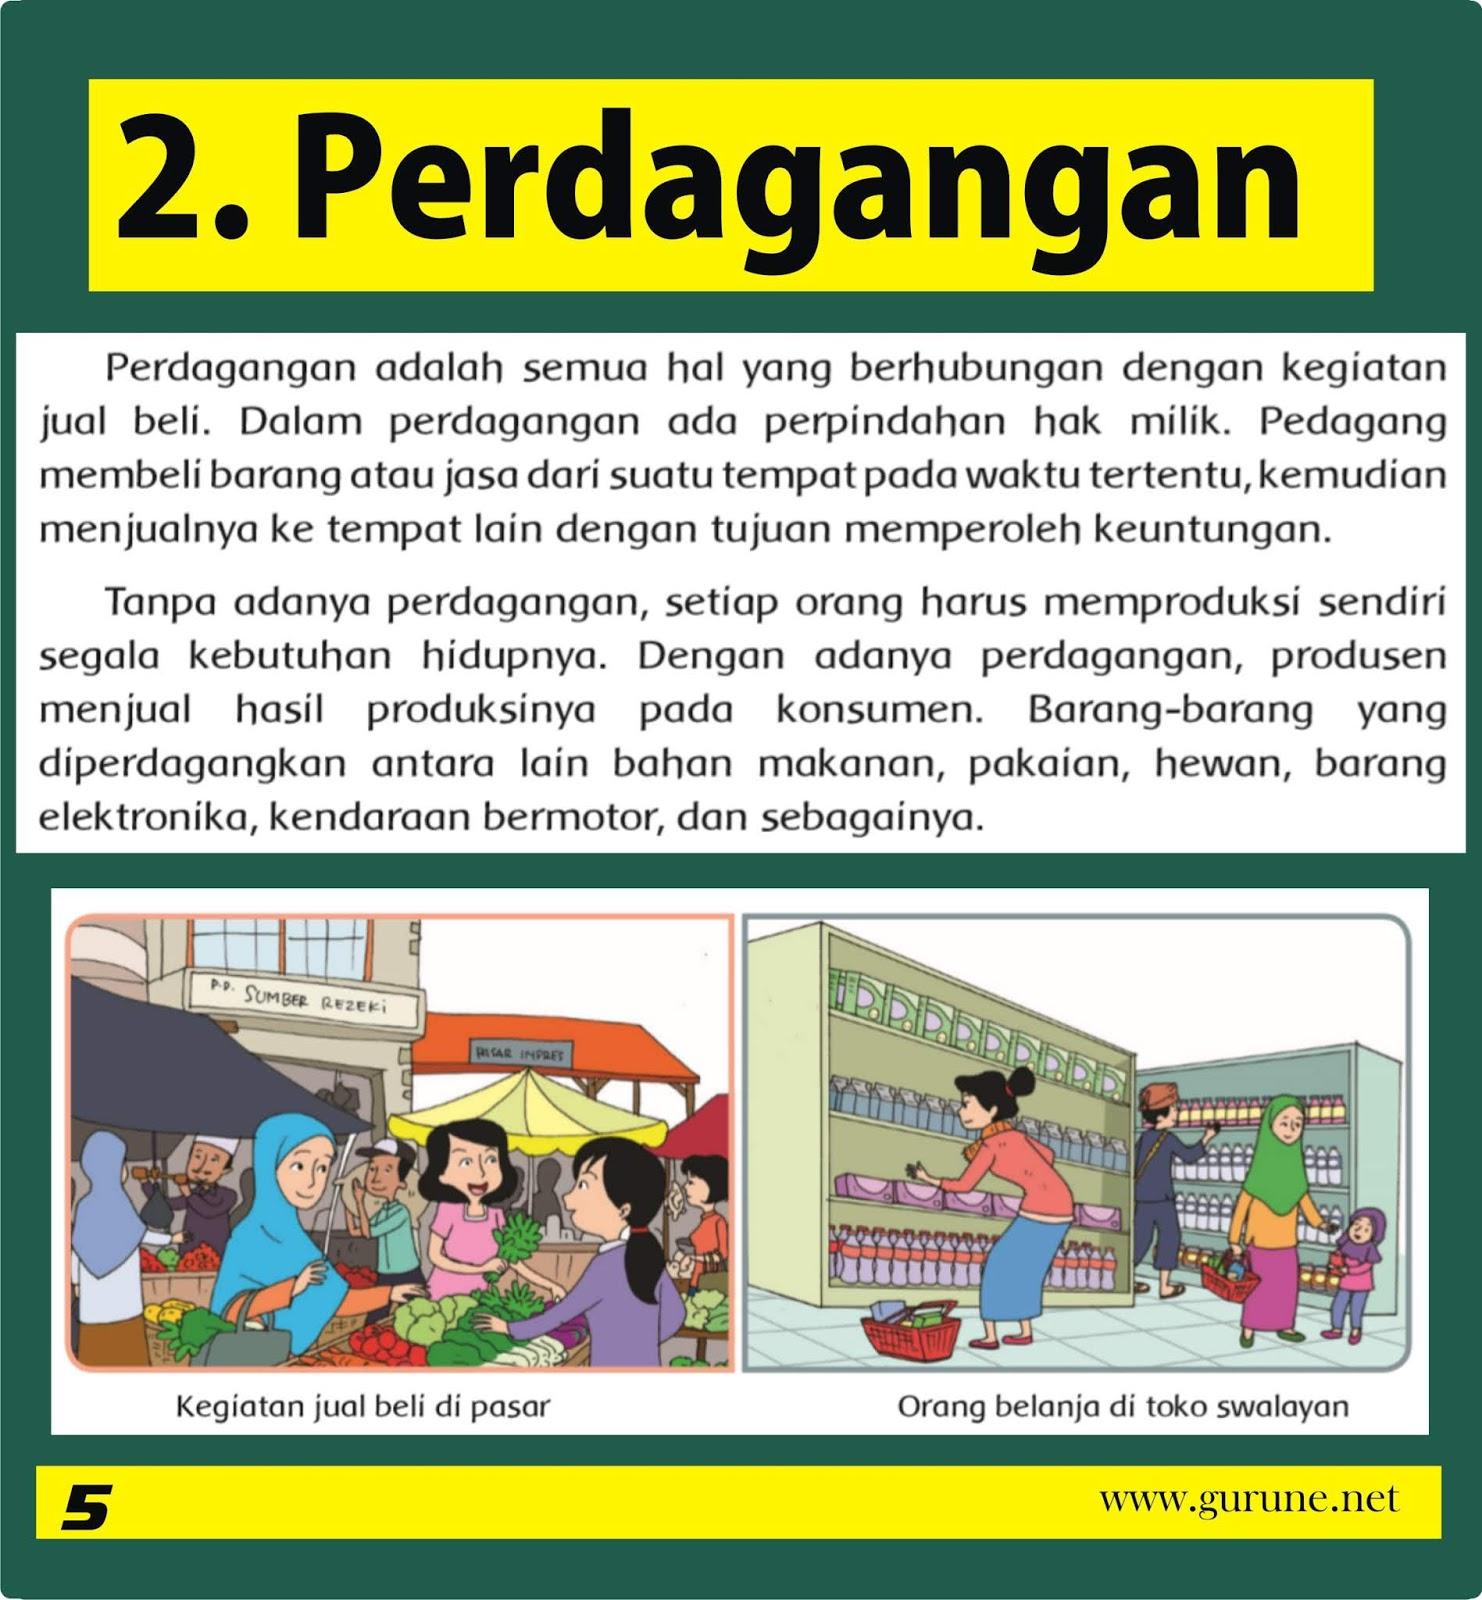 Ringkasan Materi Jenis Usaha Masyarakat Indonesia Format Grafis ( Gambar )